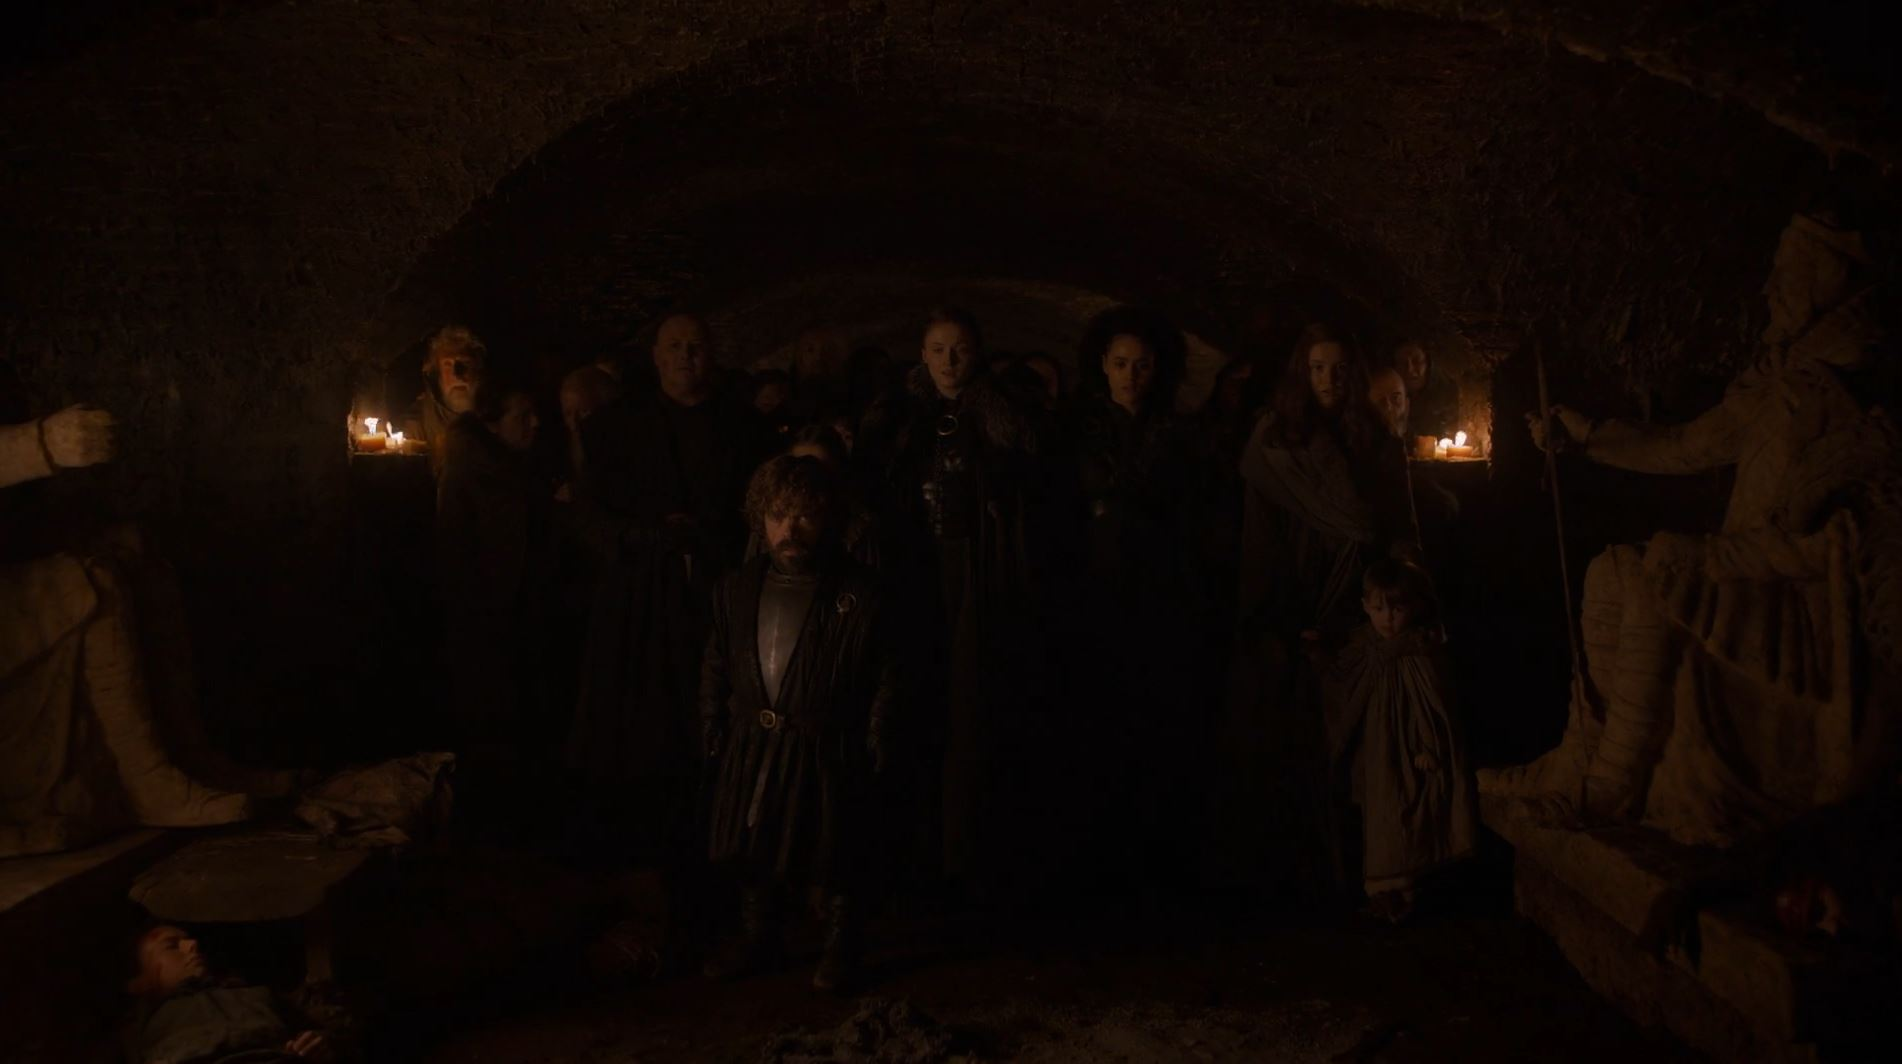 Game of Thrones season 8, episode 3 analysis: The Long Night - SlashGear